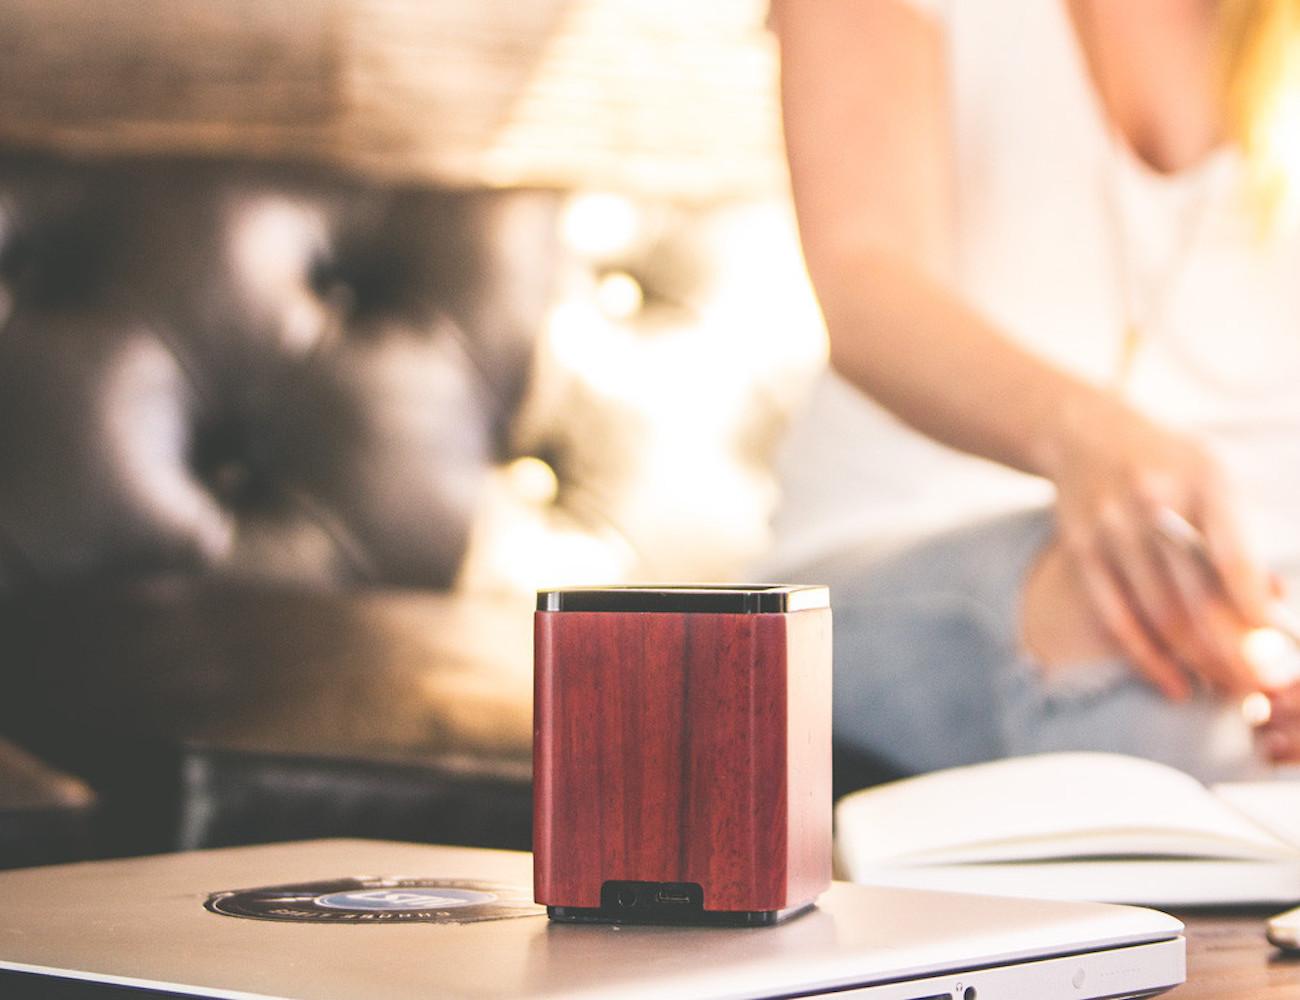 LSTN Satellite Portable Wood Speaker